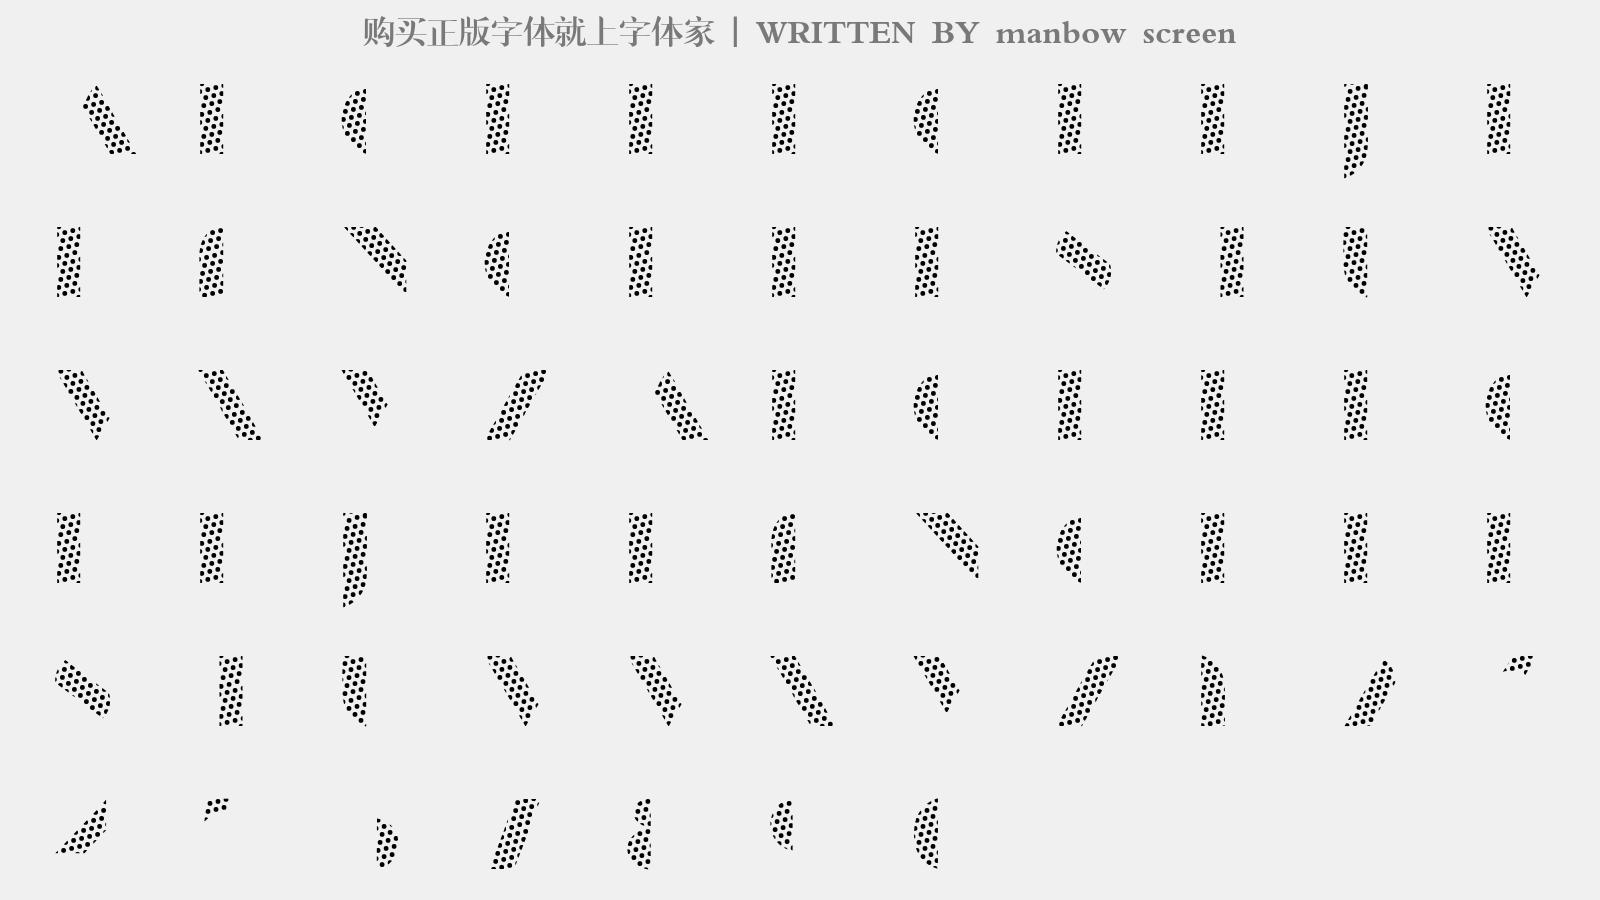 manbow screen - 大寫字母/小寫字母/數字